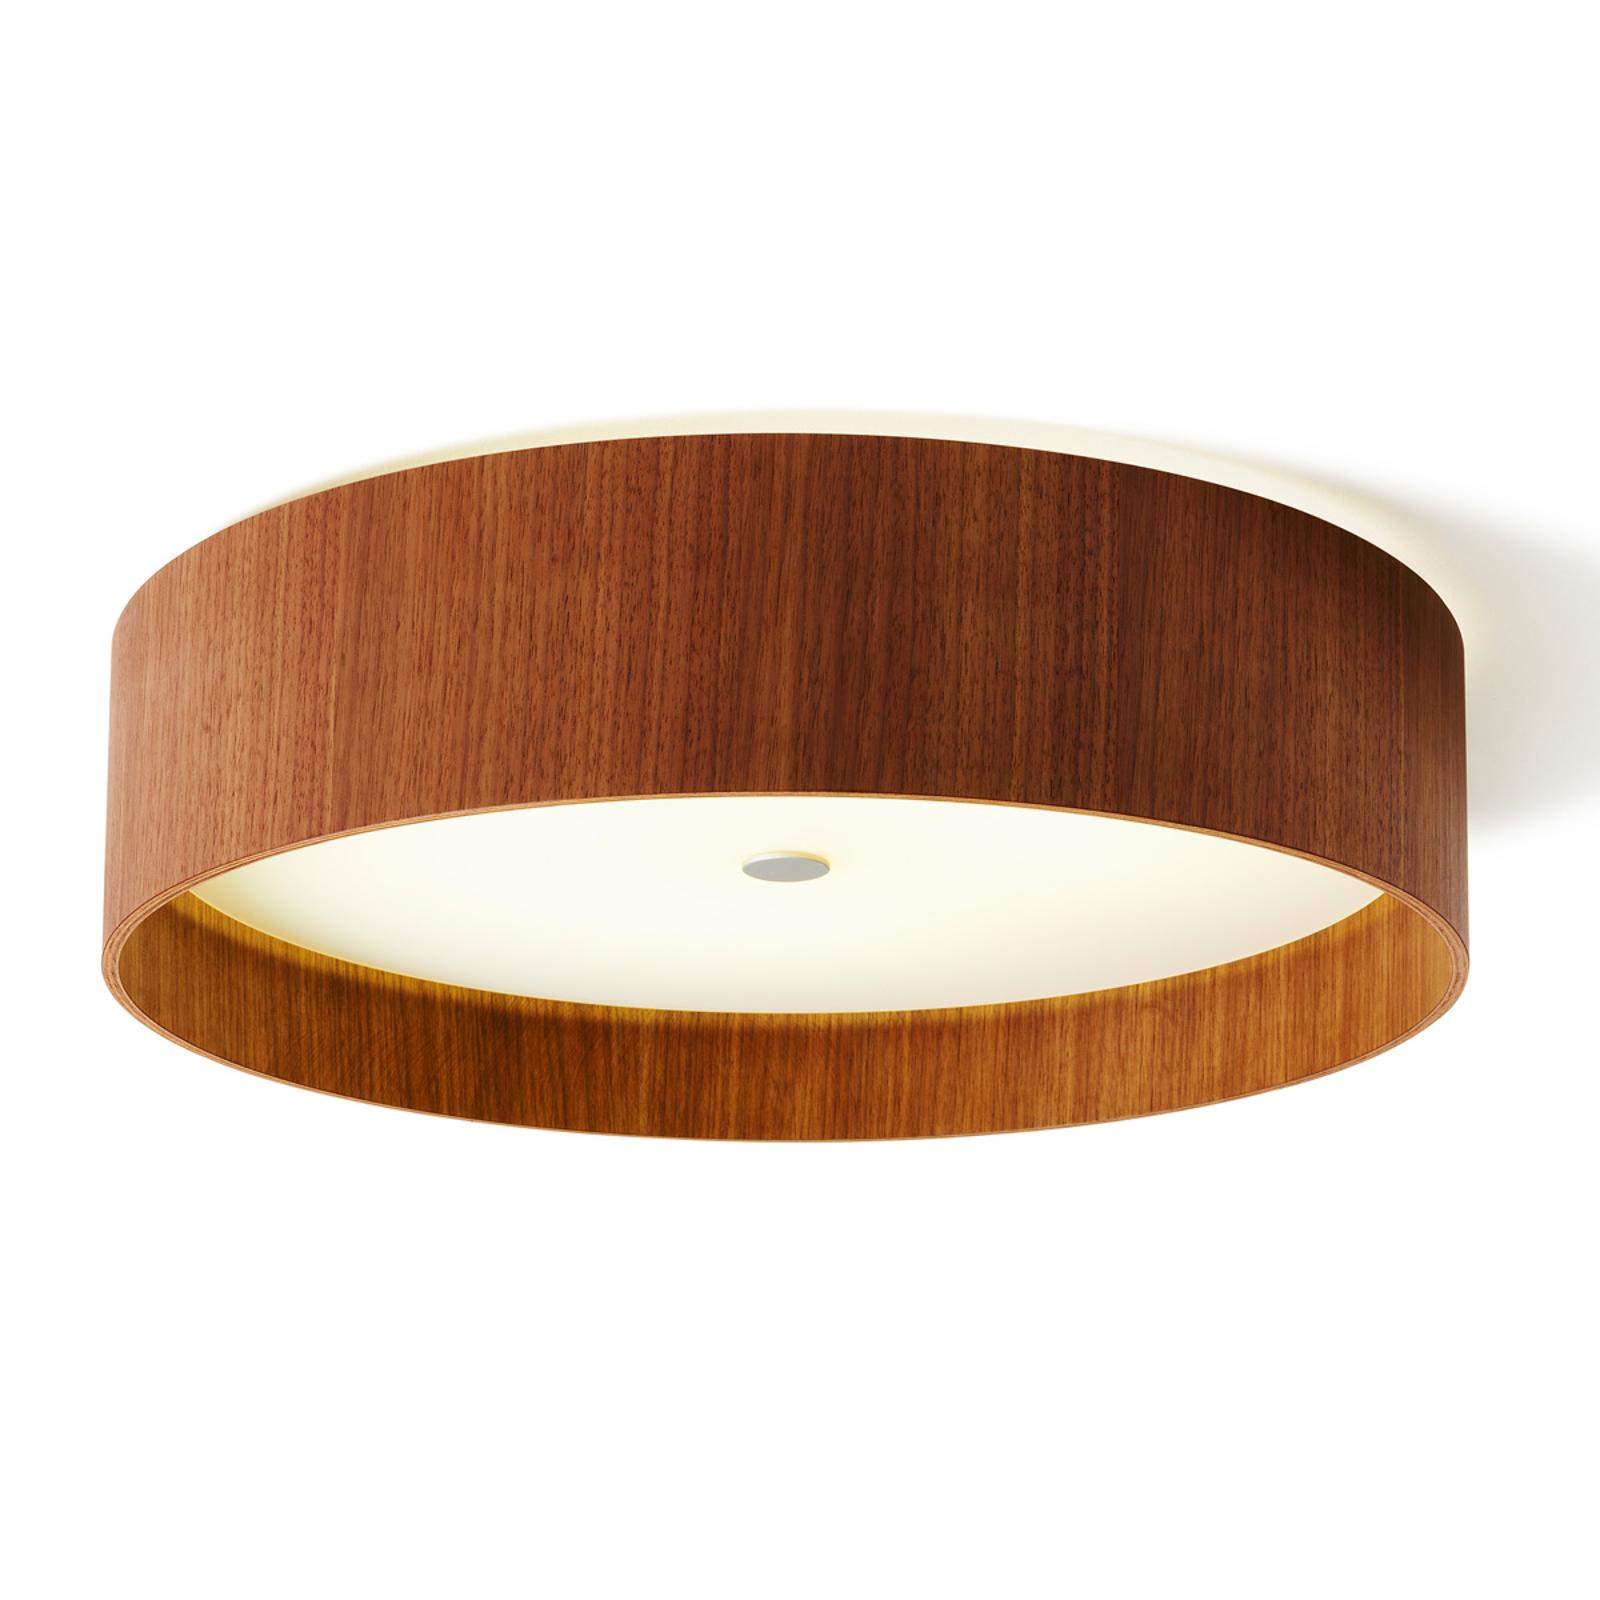 Lara wood - LED ceiling light, walnut 55cm_2600505_1